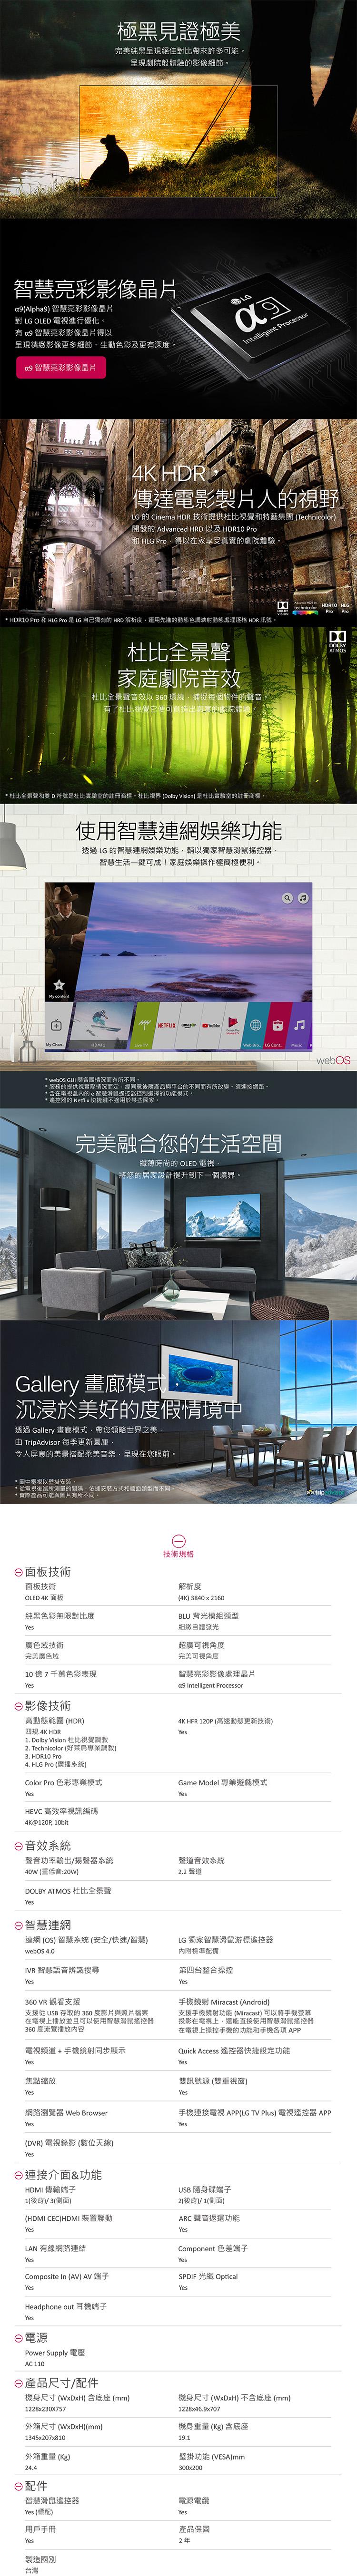 181002-LG-OLED電視-55C8P